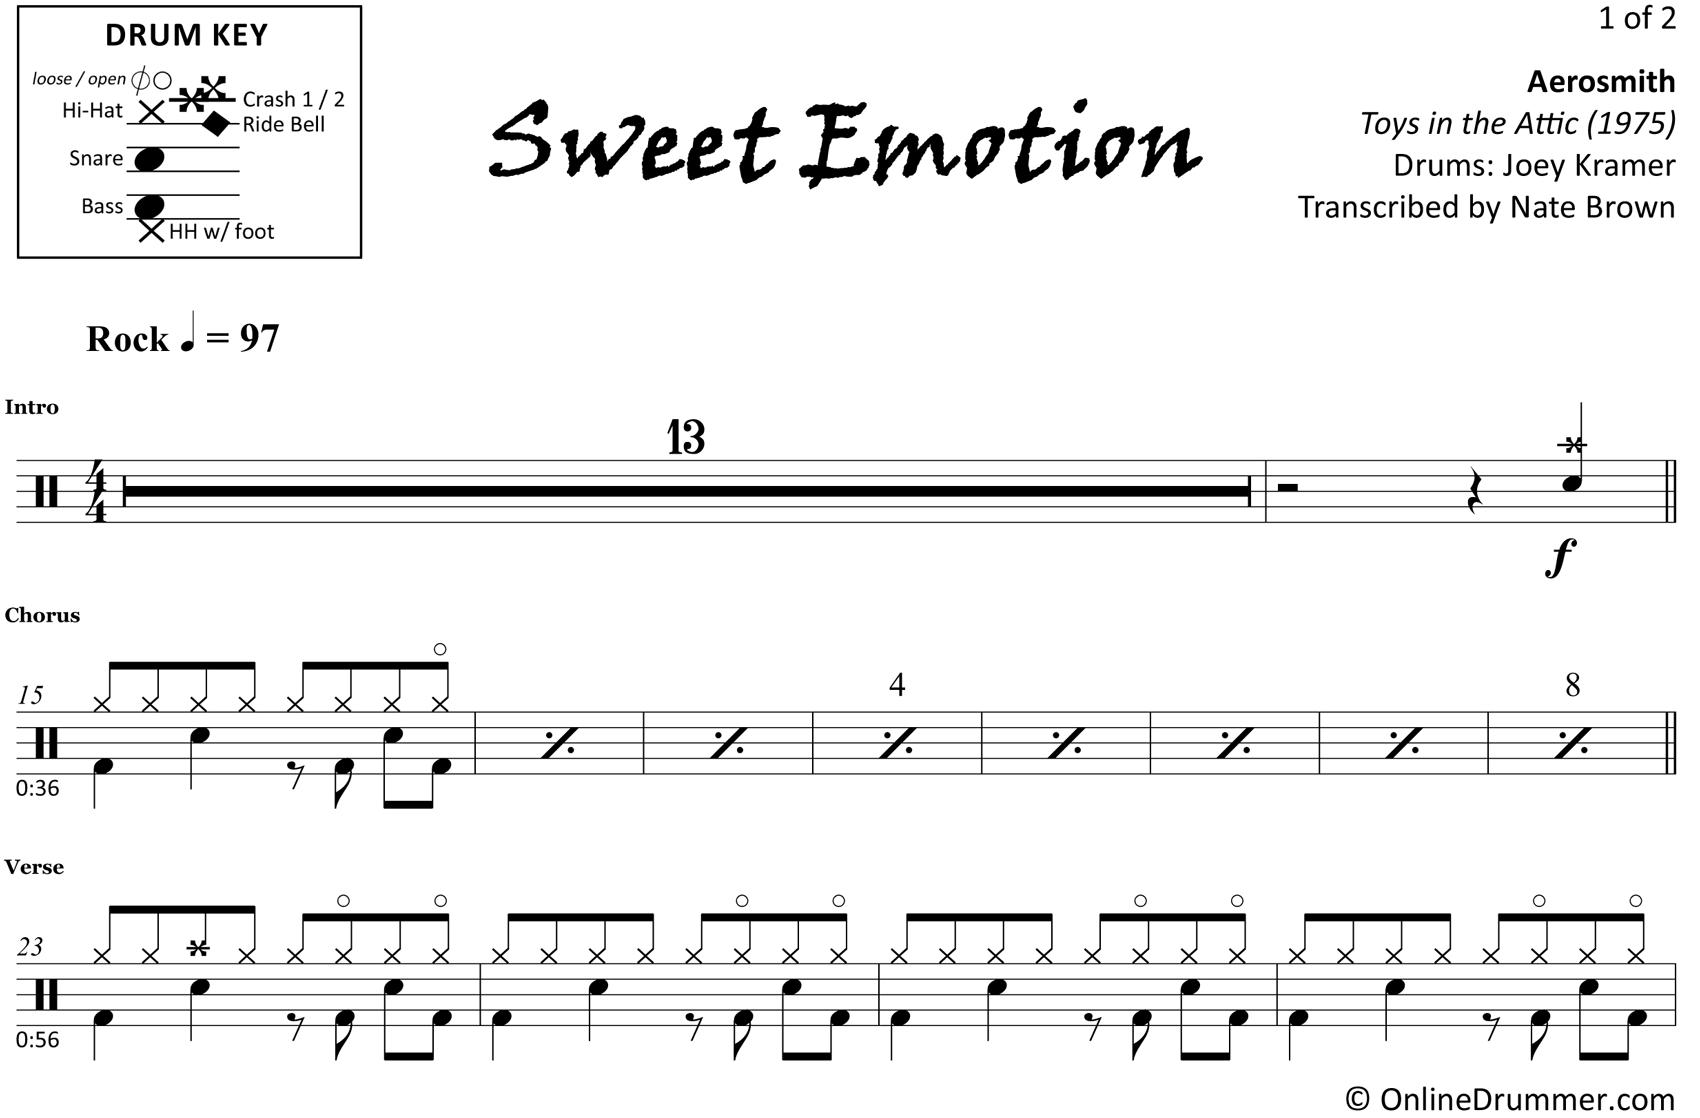 Sweet Emotion - Aerosmith - Drum Sheet Music